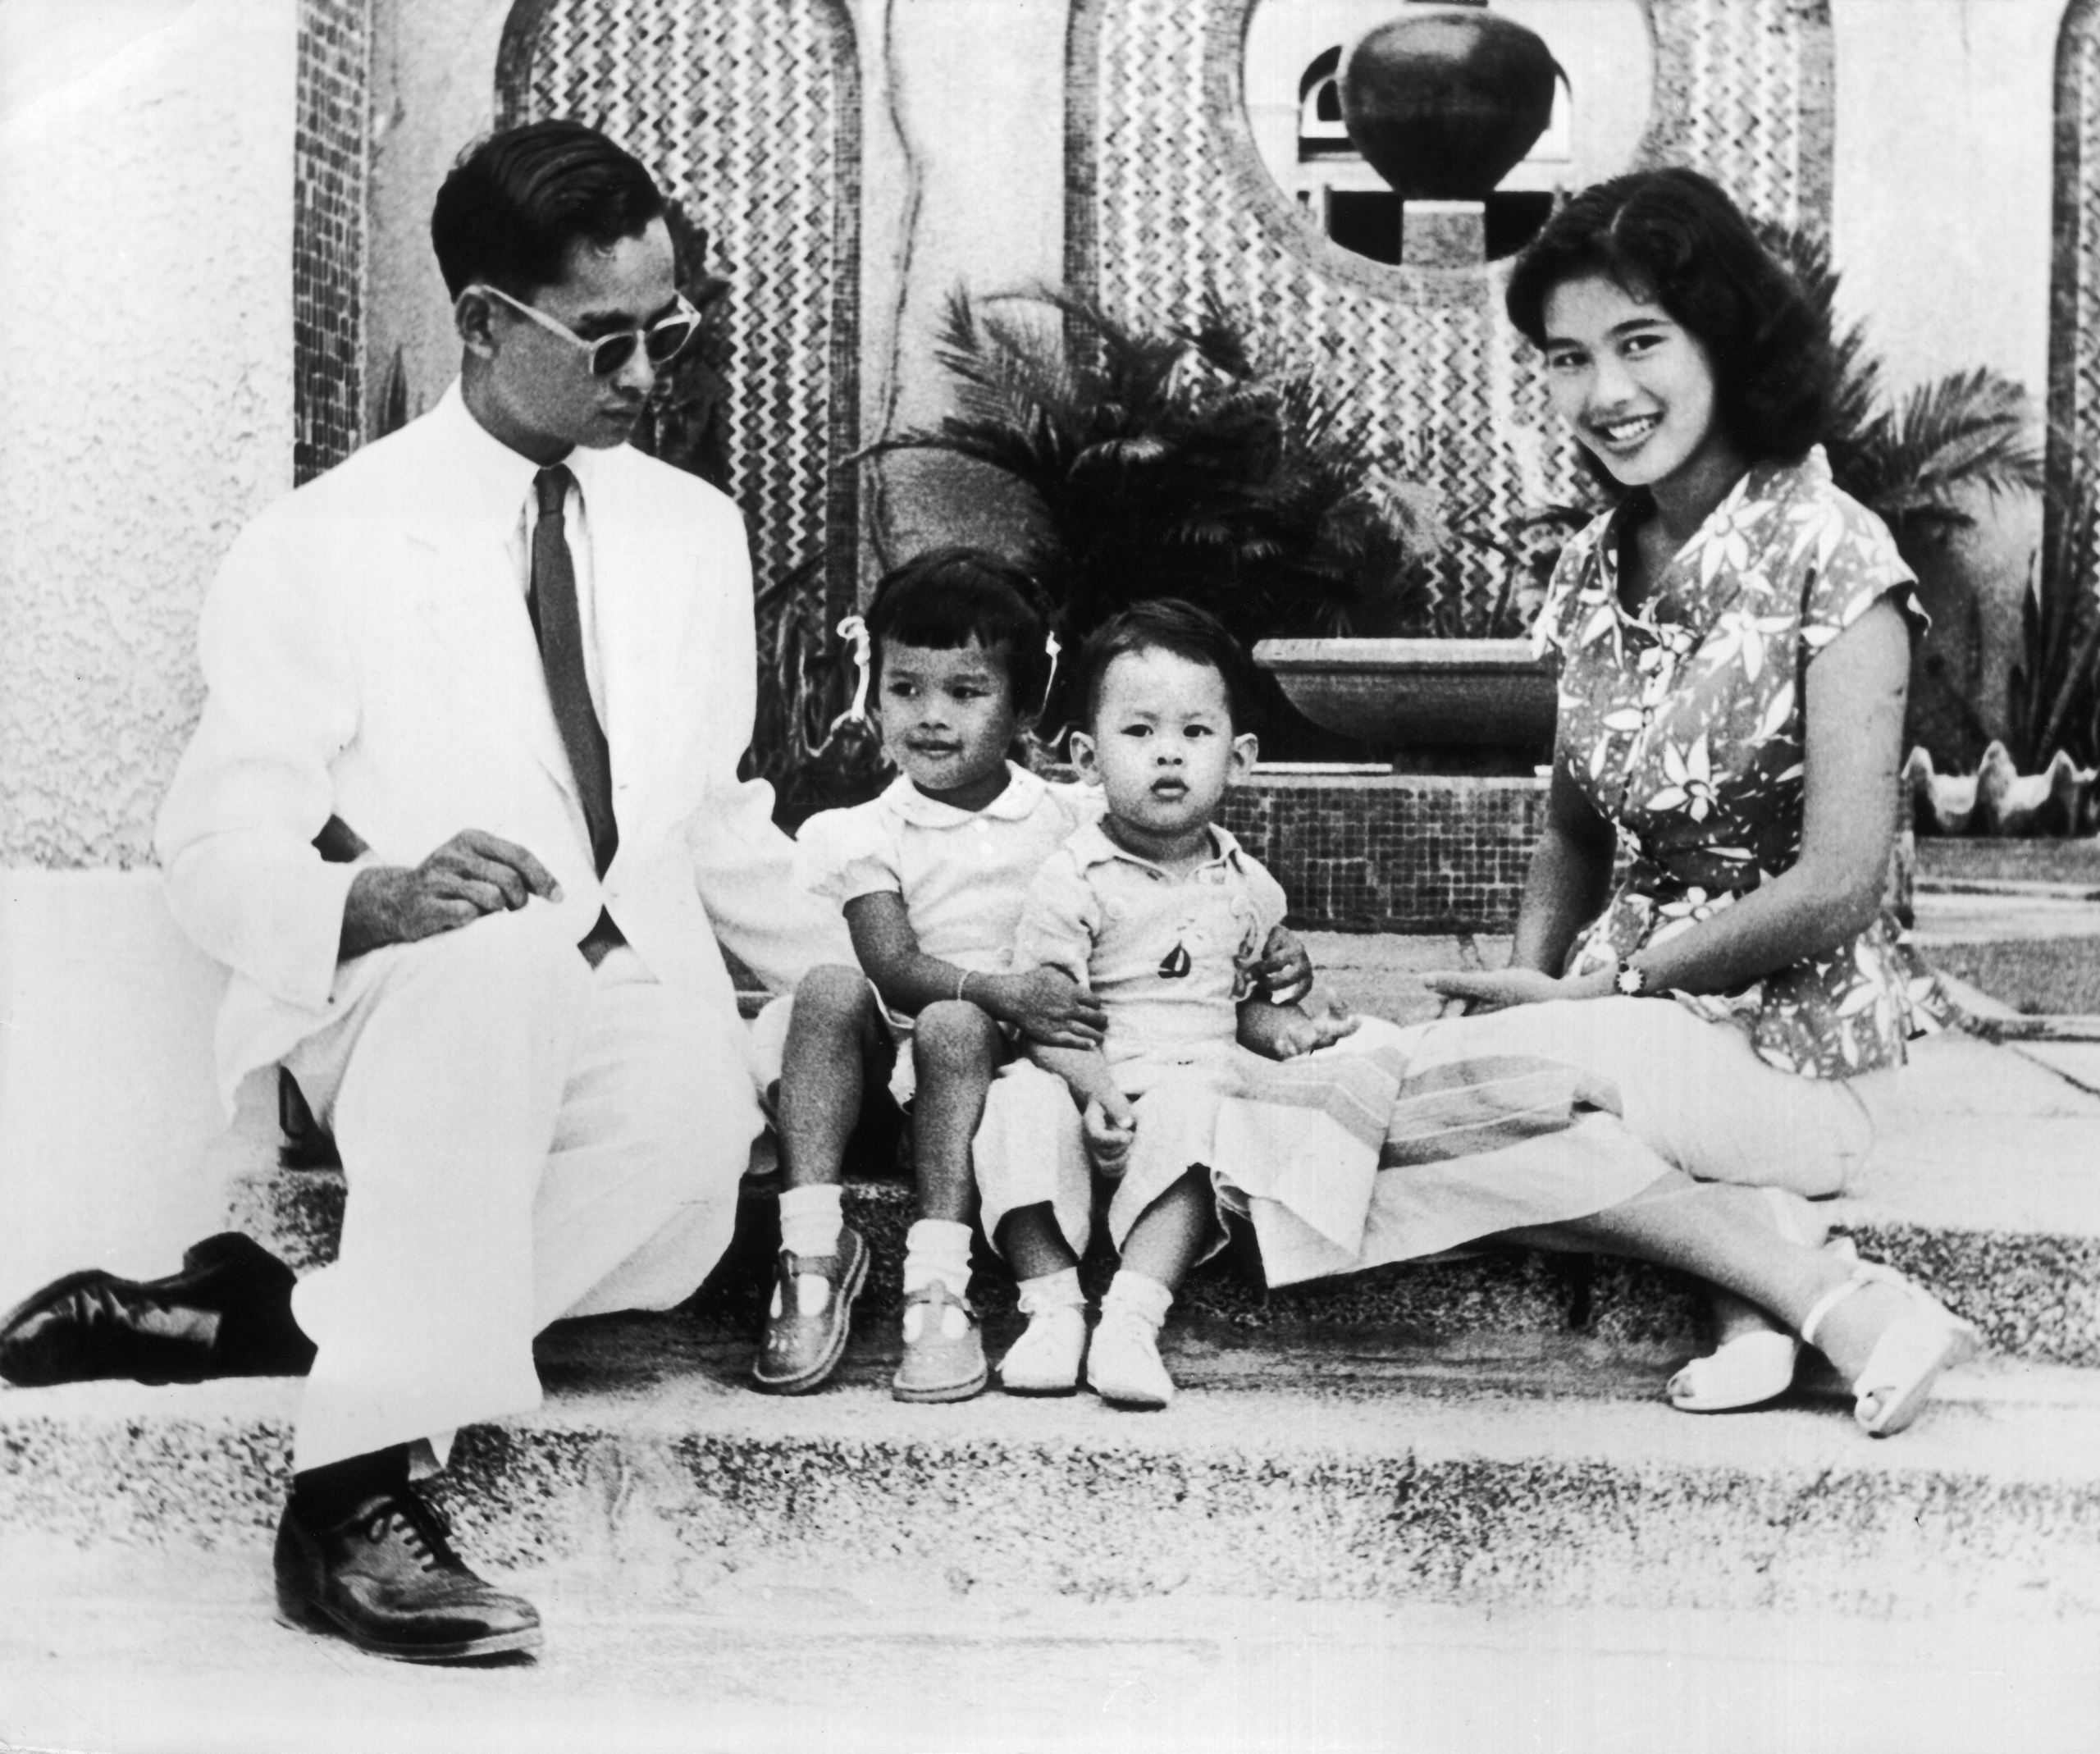 King Bhumibol Adulyadej with his wife Queen Sirikit and their children Crown Prince Maha Vajiralongkorn (right) and Princess Ubolratana Rajakanya in 1954.